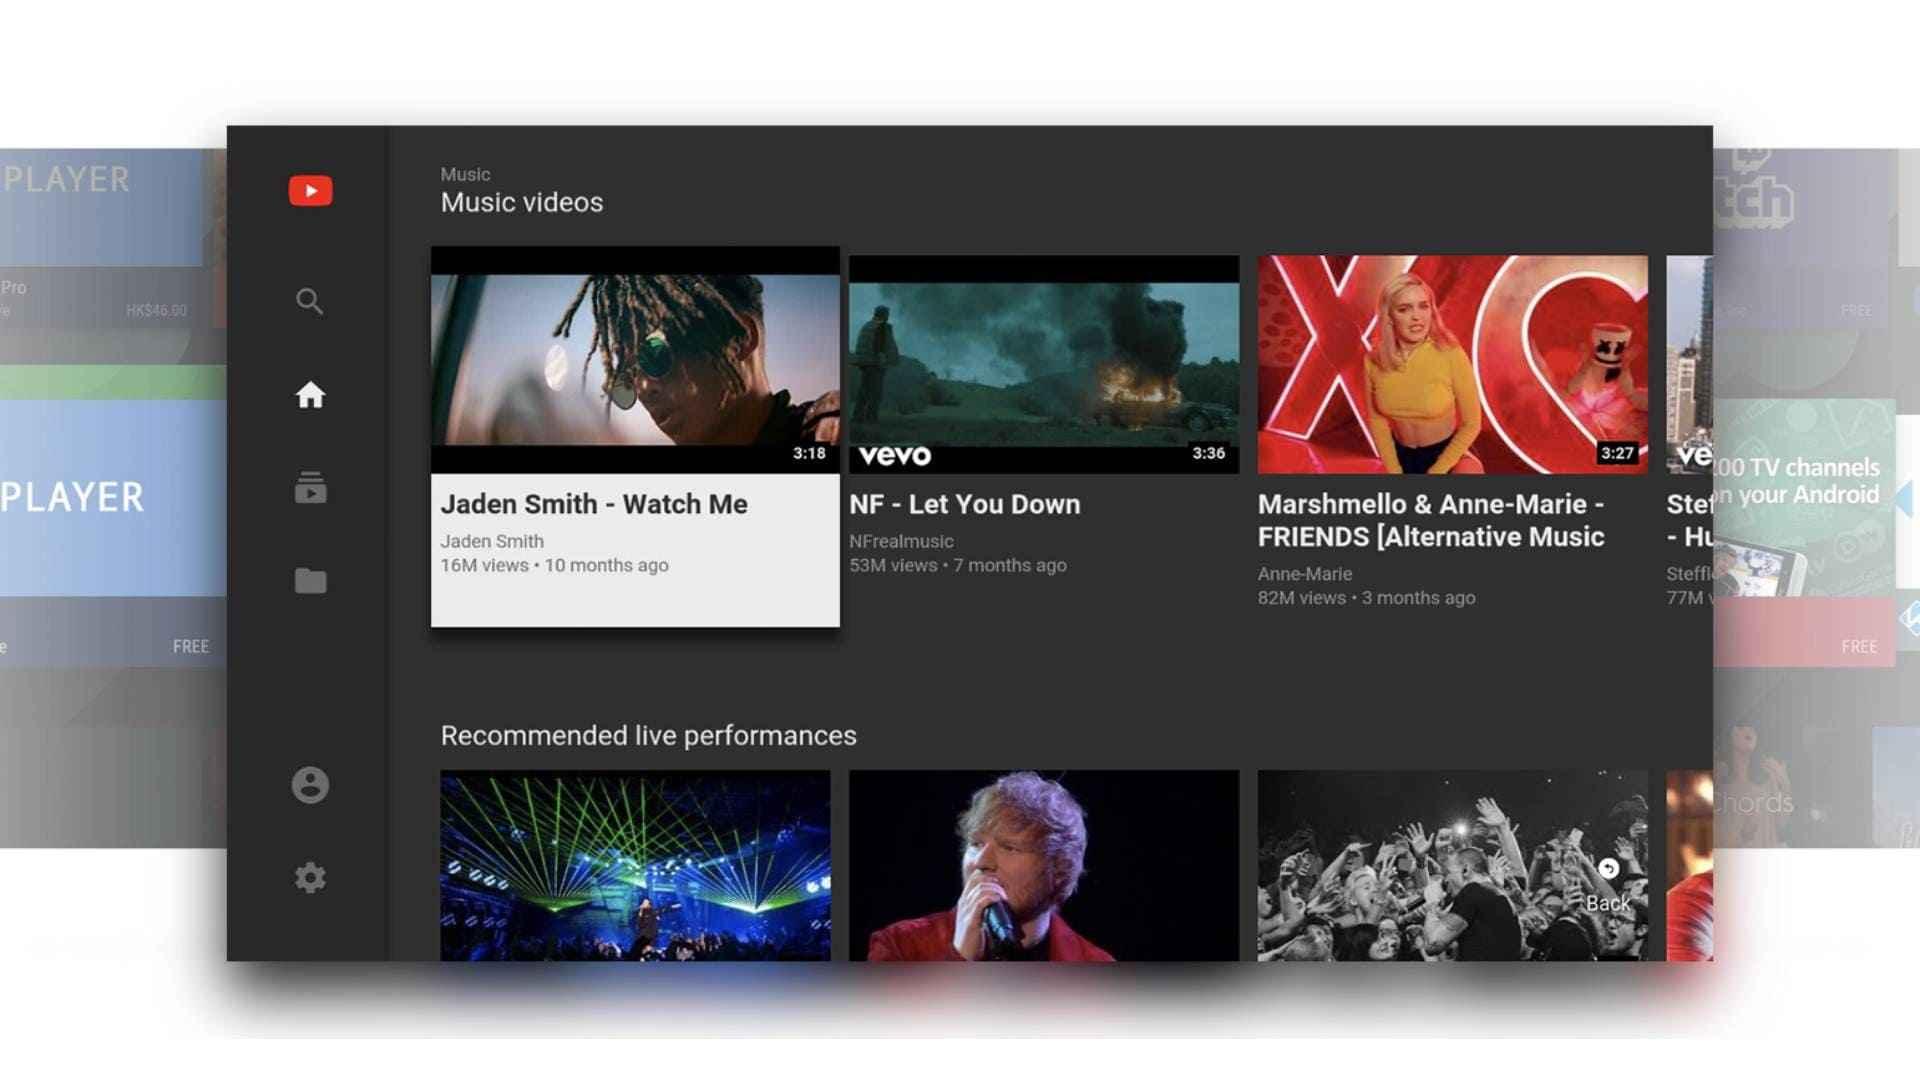 TCL Smart LED TV Youtube